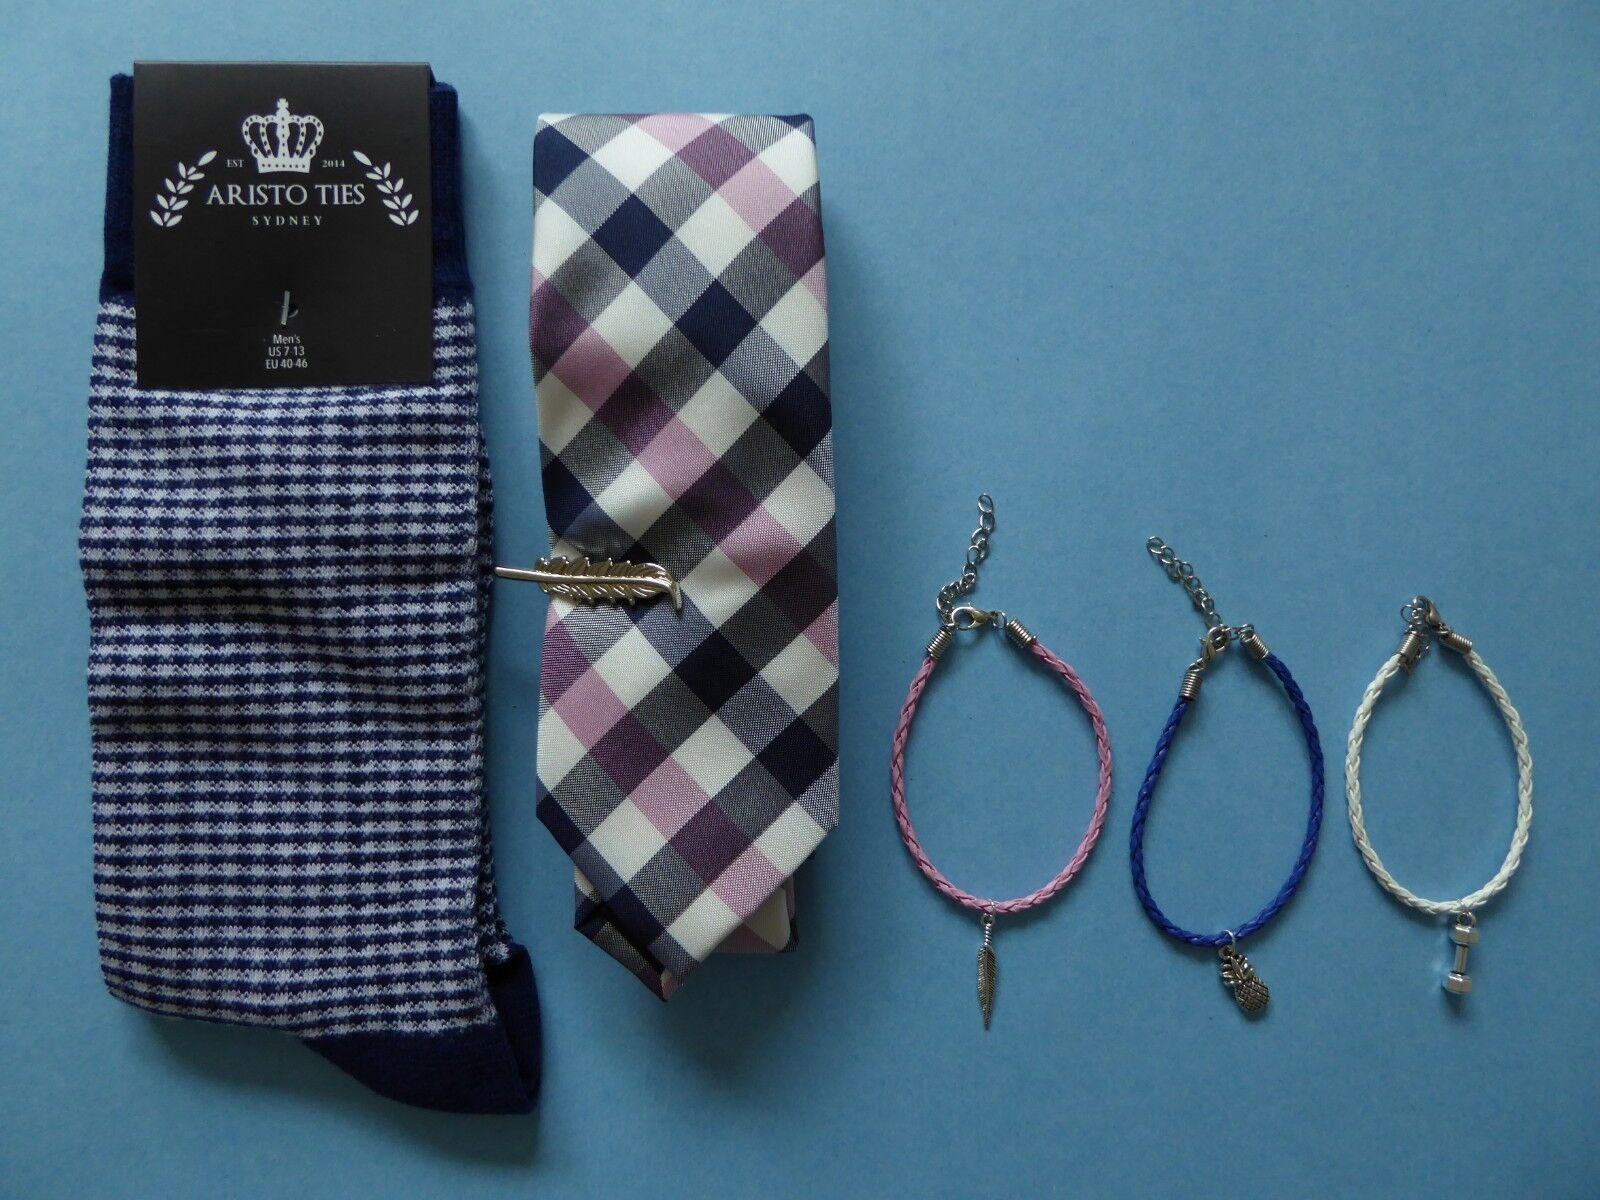 Socks + Tie + Bracelet - Men's Accessories Bedford & Broome Aristo Ties Gingham